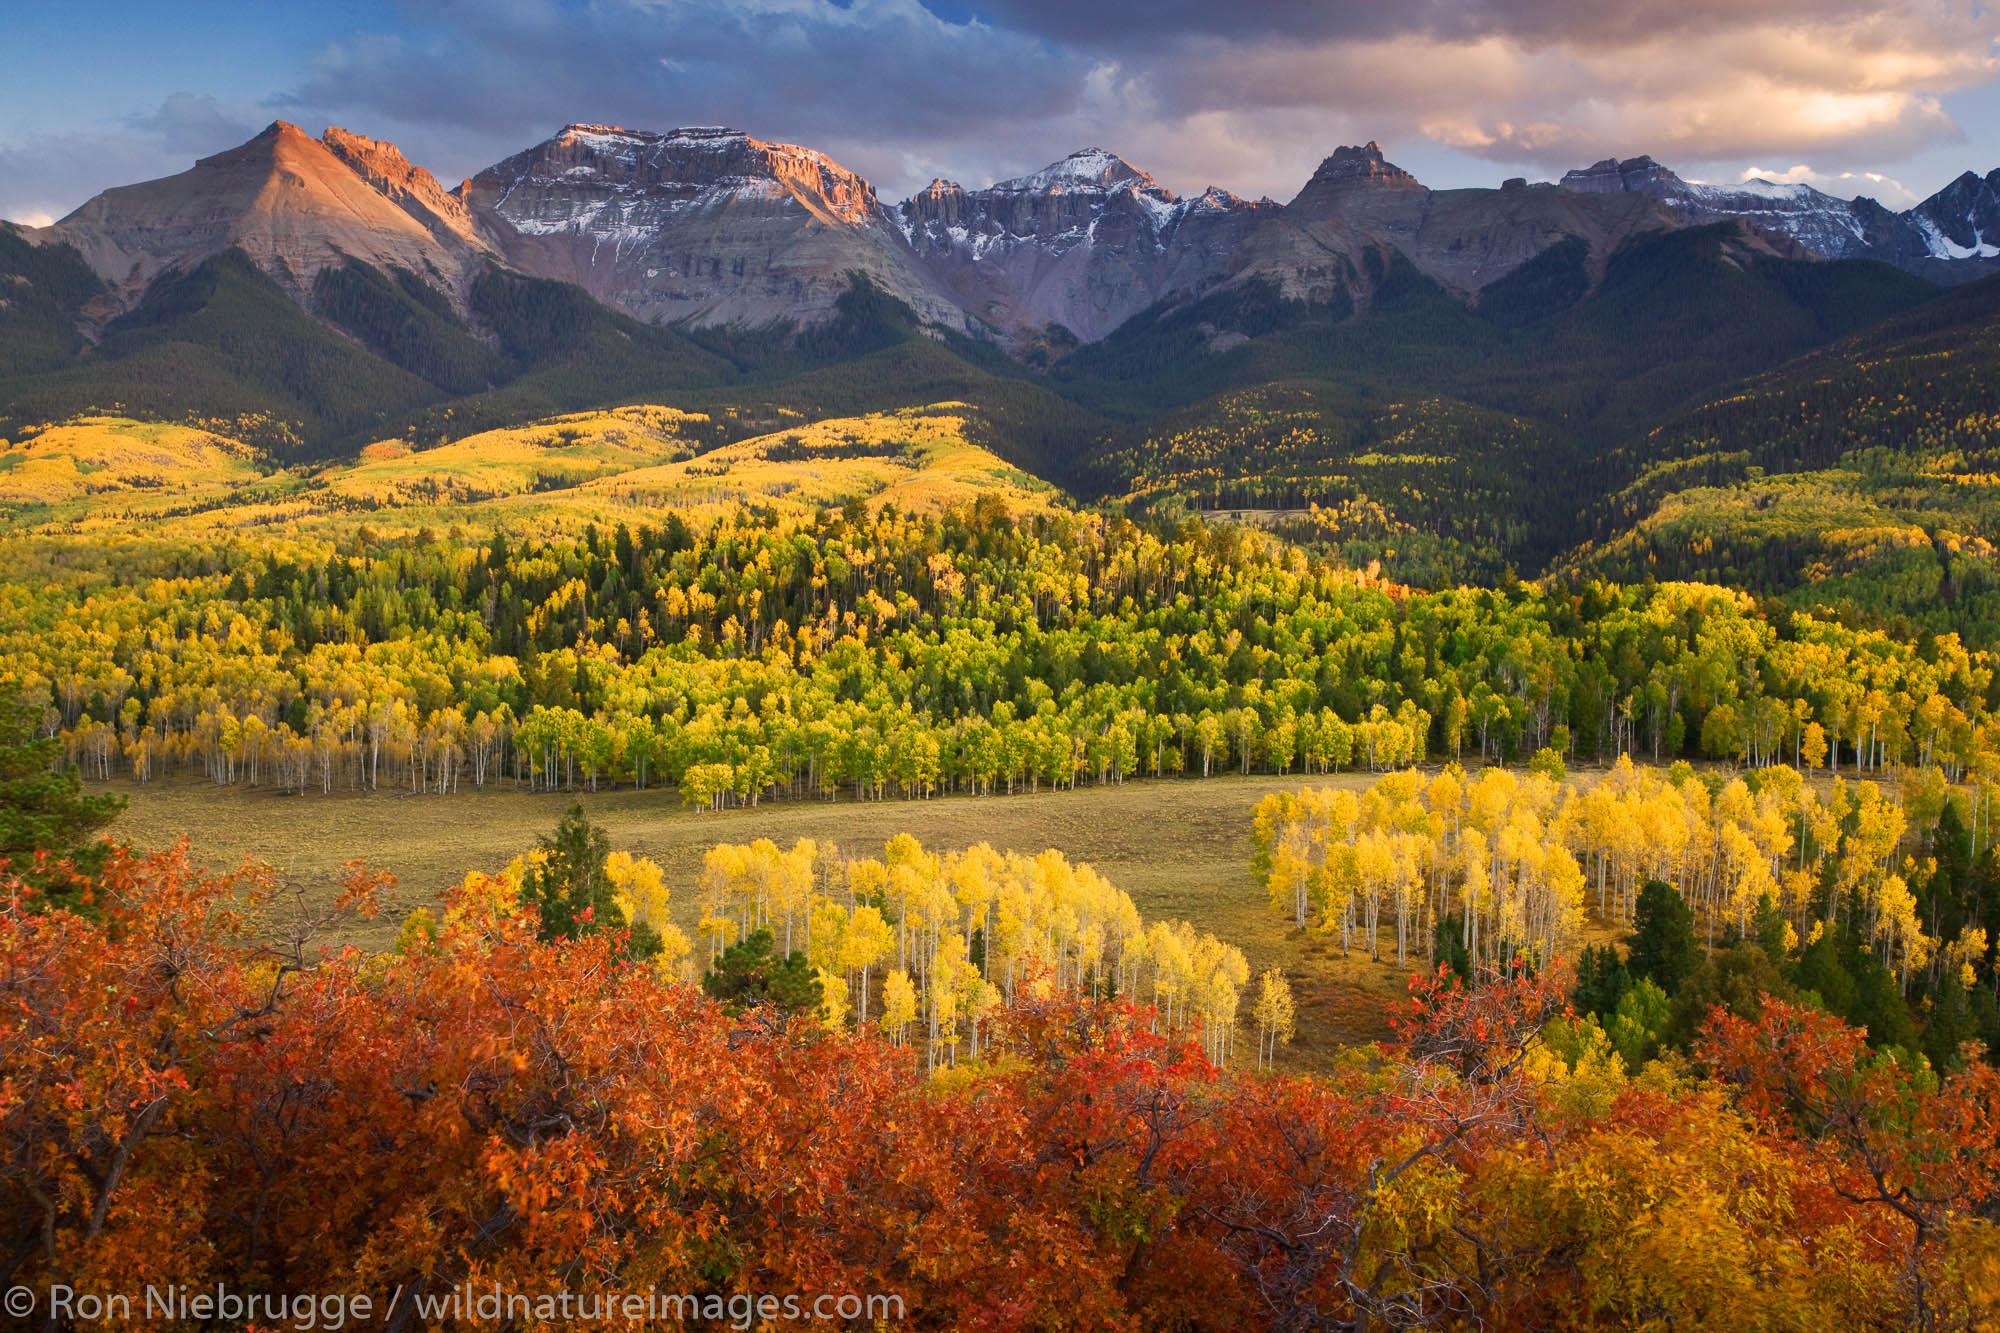 Autumn colors and the Sneffels Range, San Juan Mountains, Colorado.